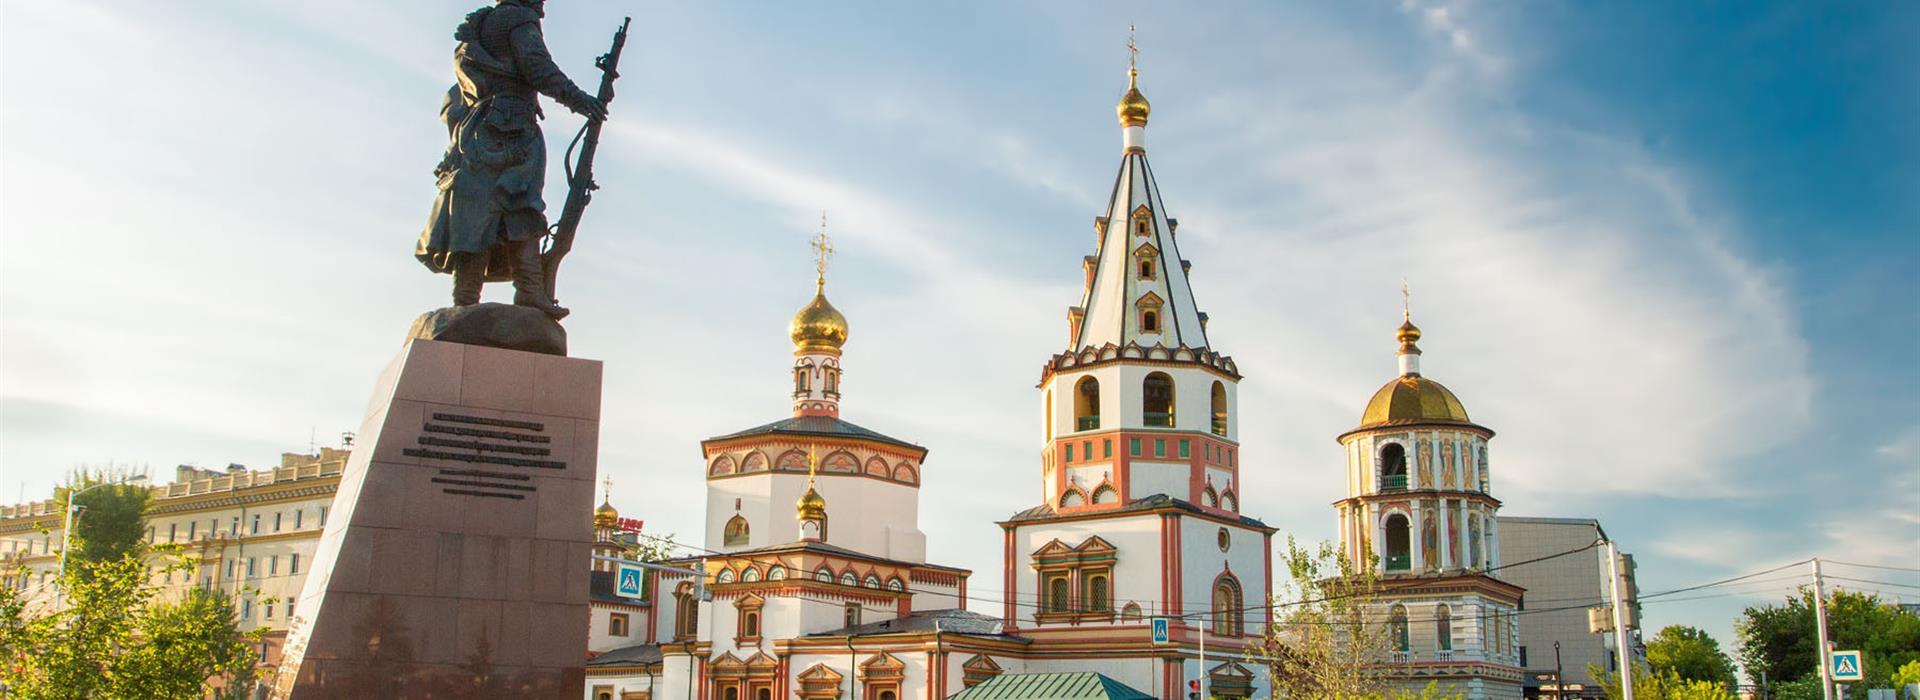 Russia-Irkutsk_736031545